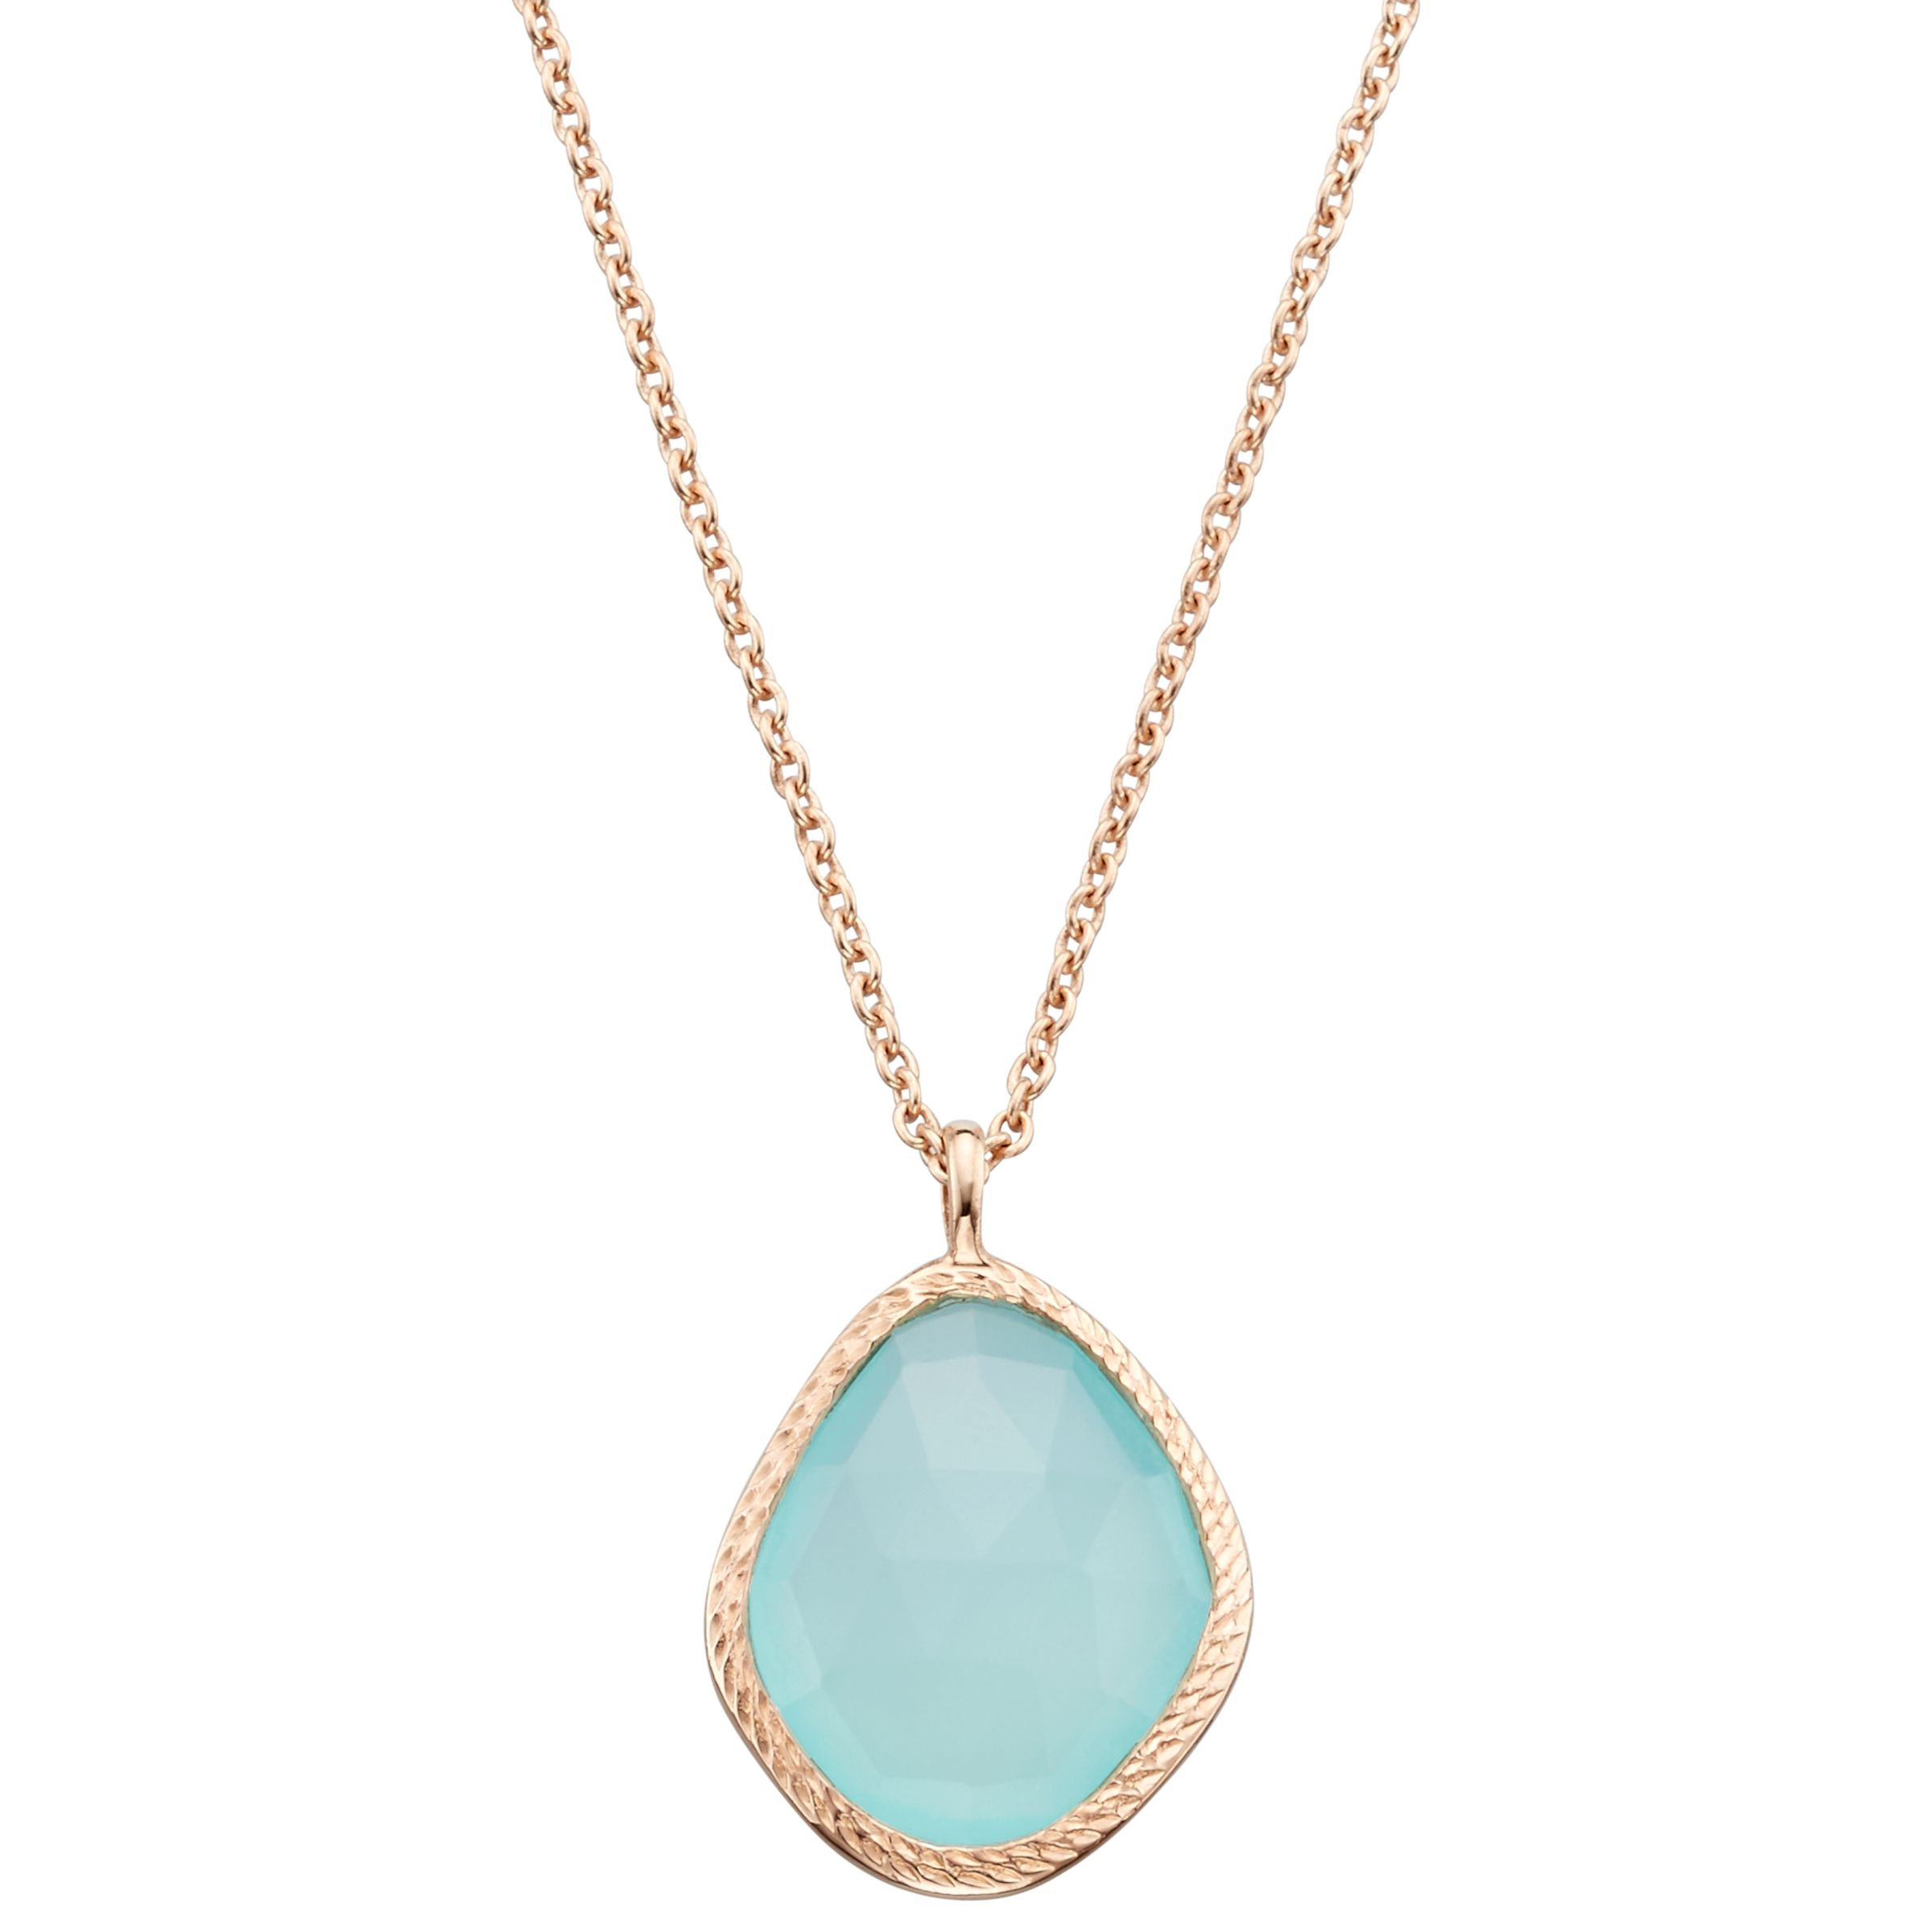 John Lewis Gemstones John Lewis Gemstones Aqua Chalcedony Organic Pendant Necklace, Rose Gold/Blue